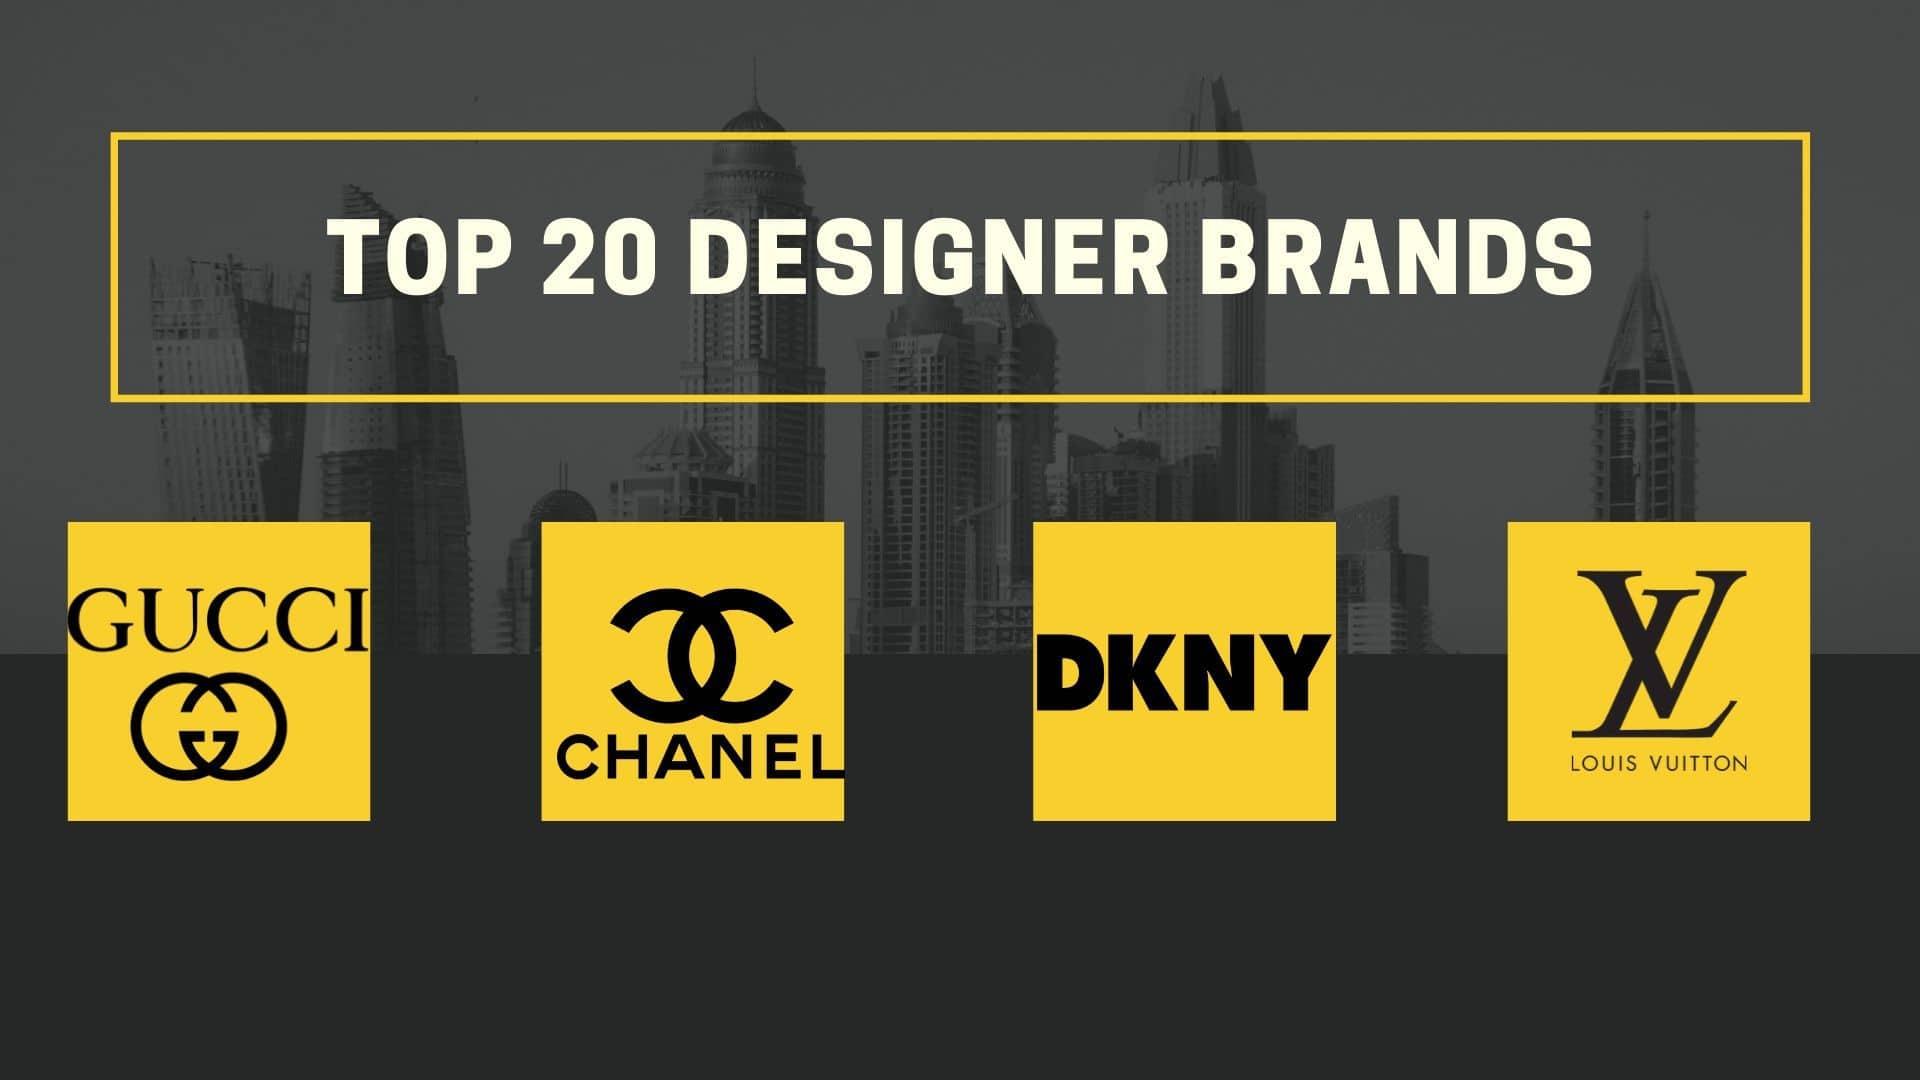 Top 20 Designer Brands